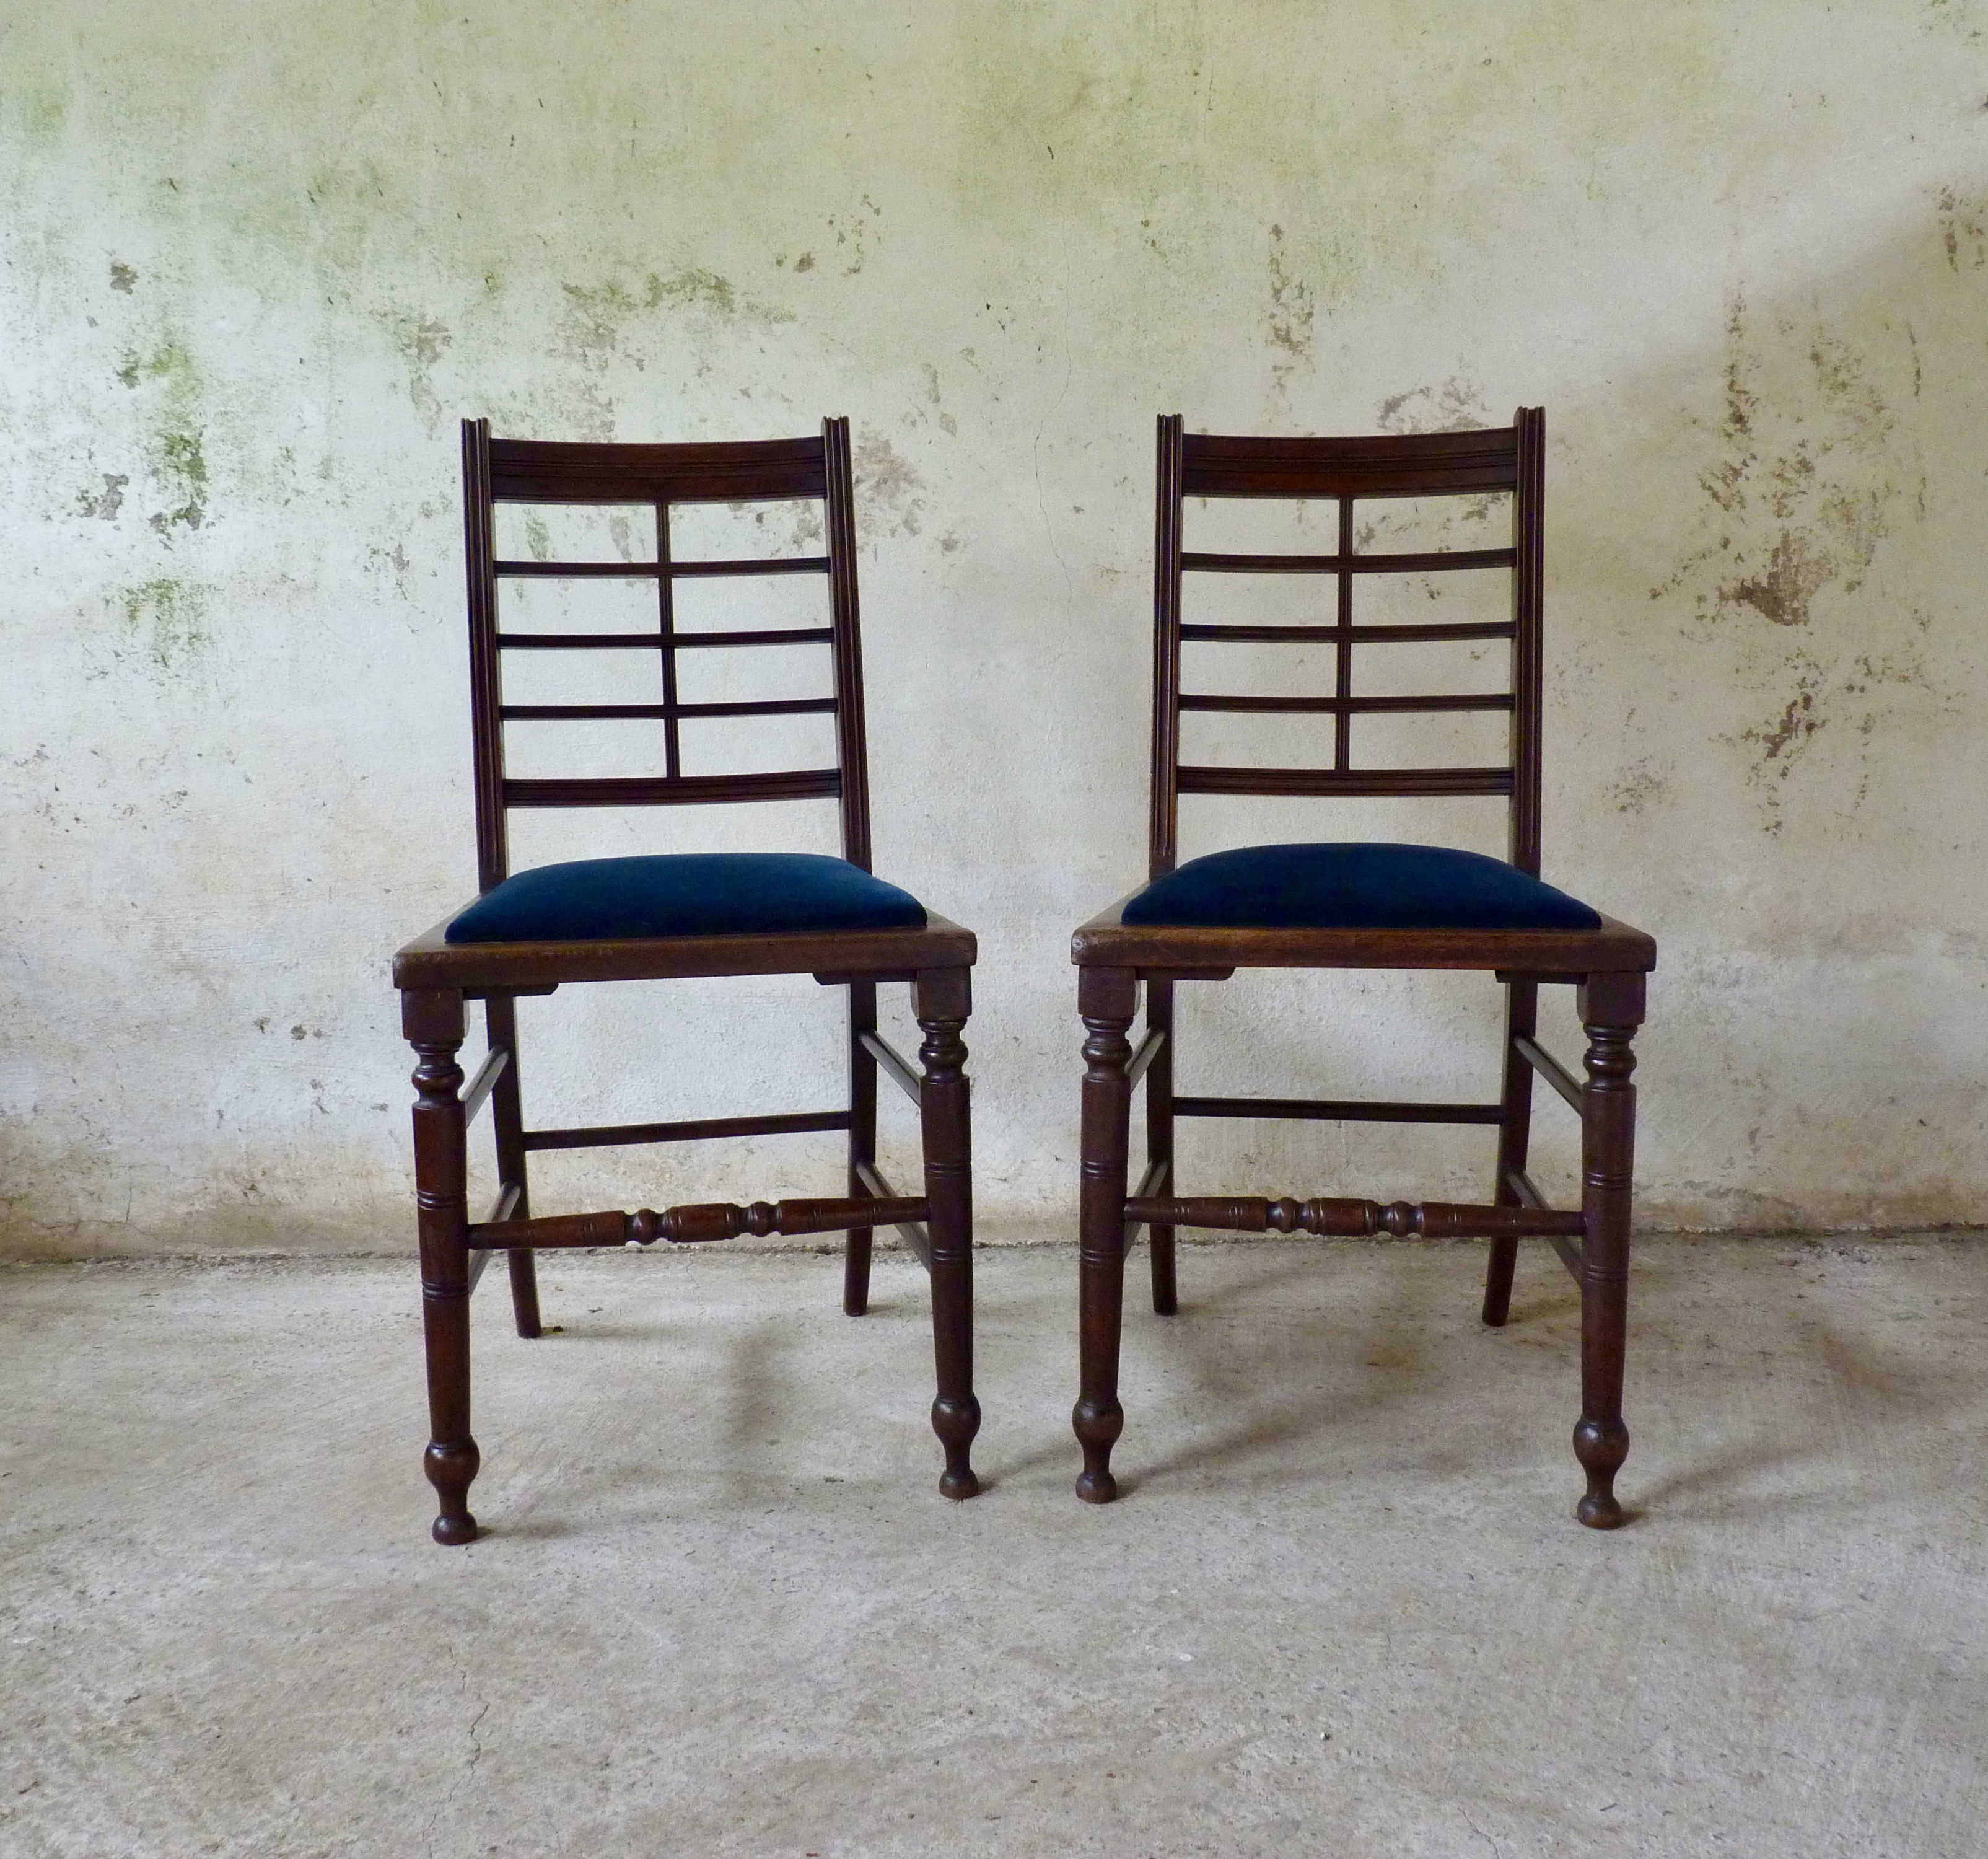 Pair of aesthetic movement mahogany chairs